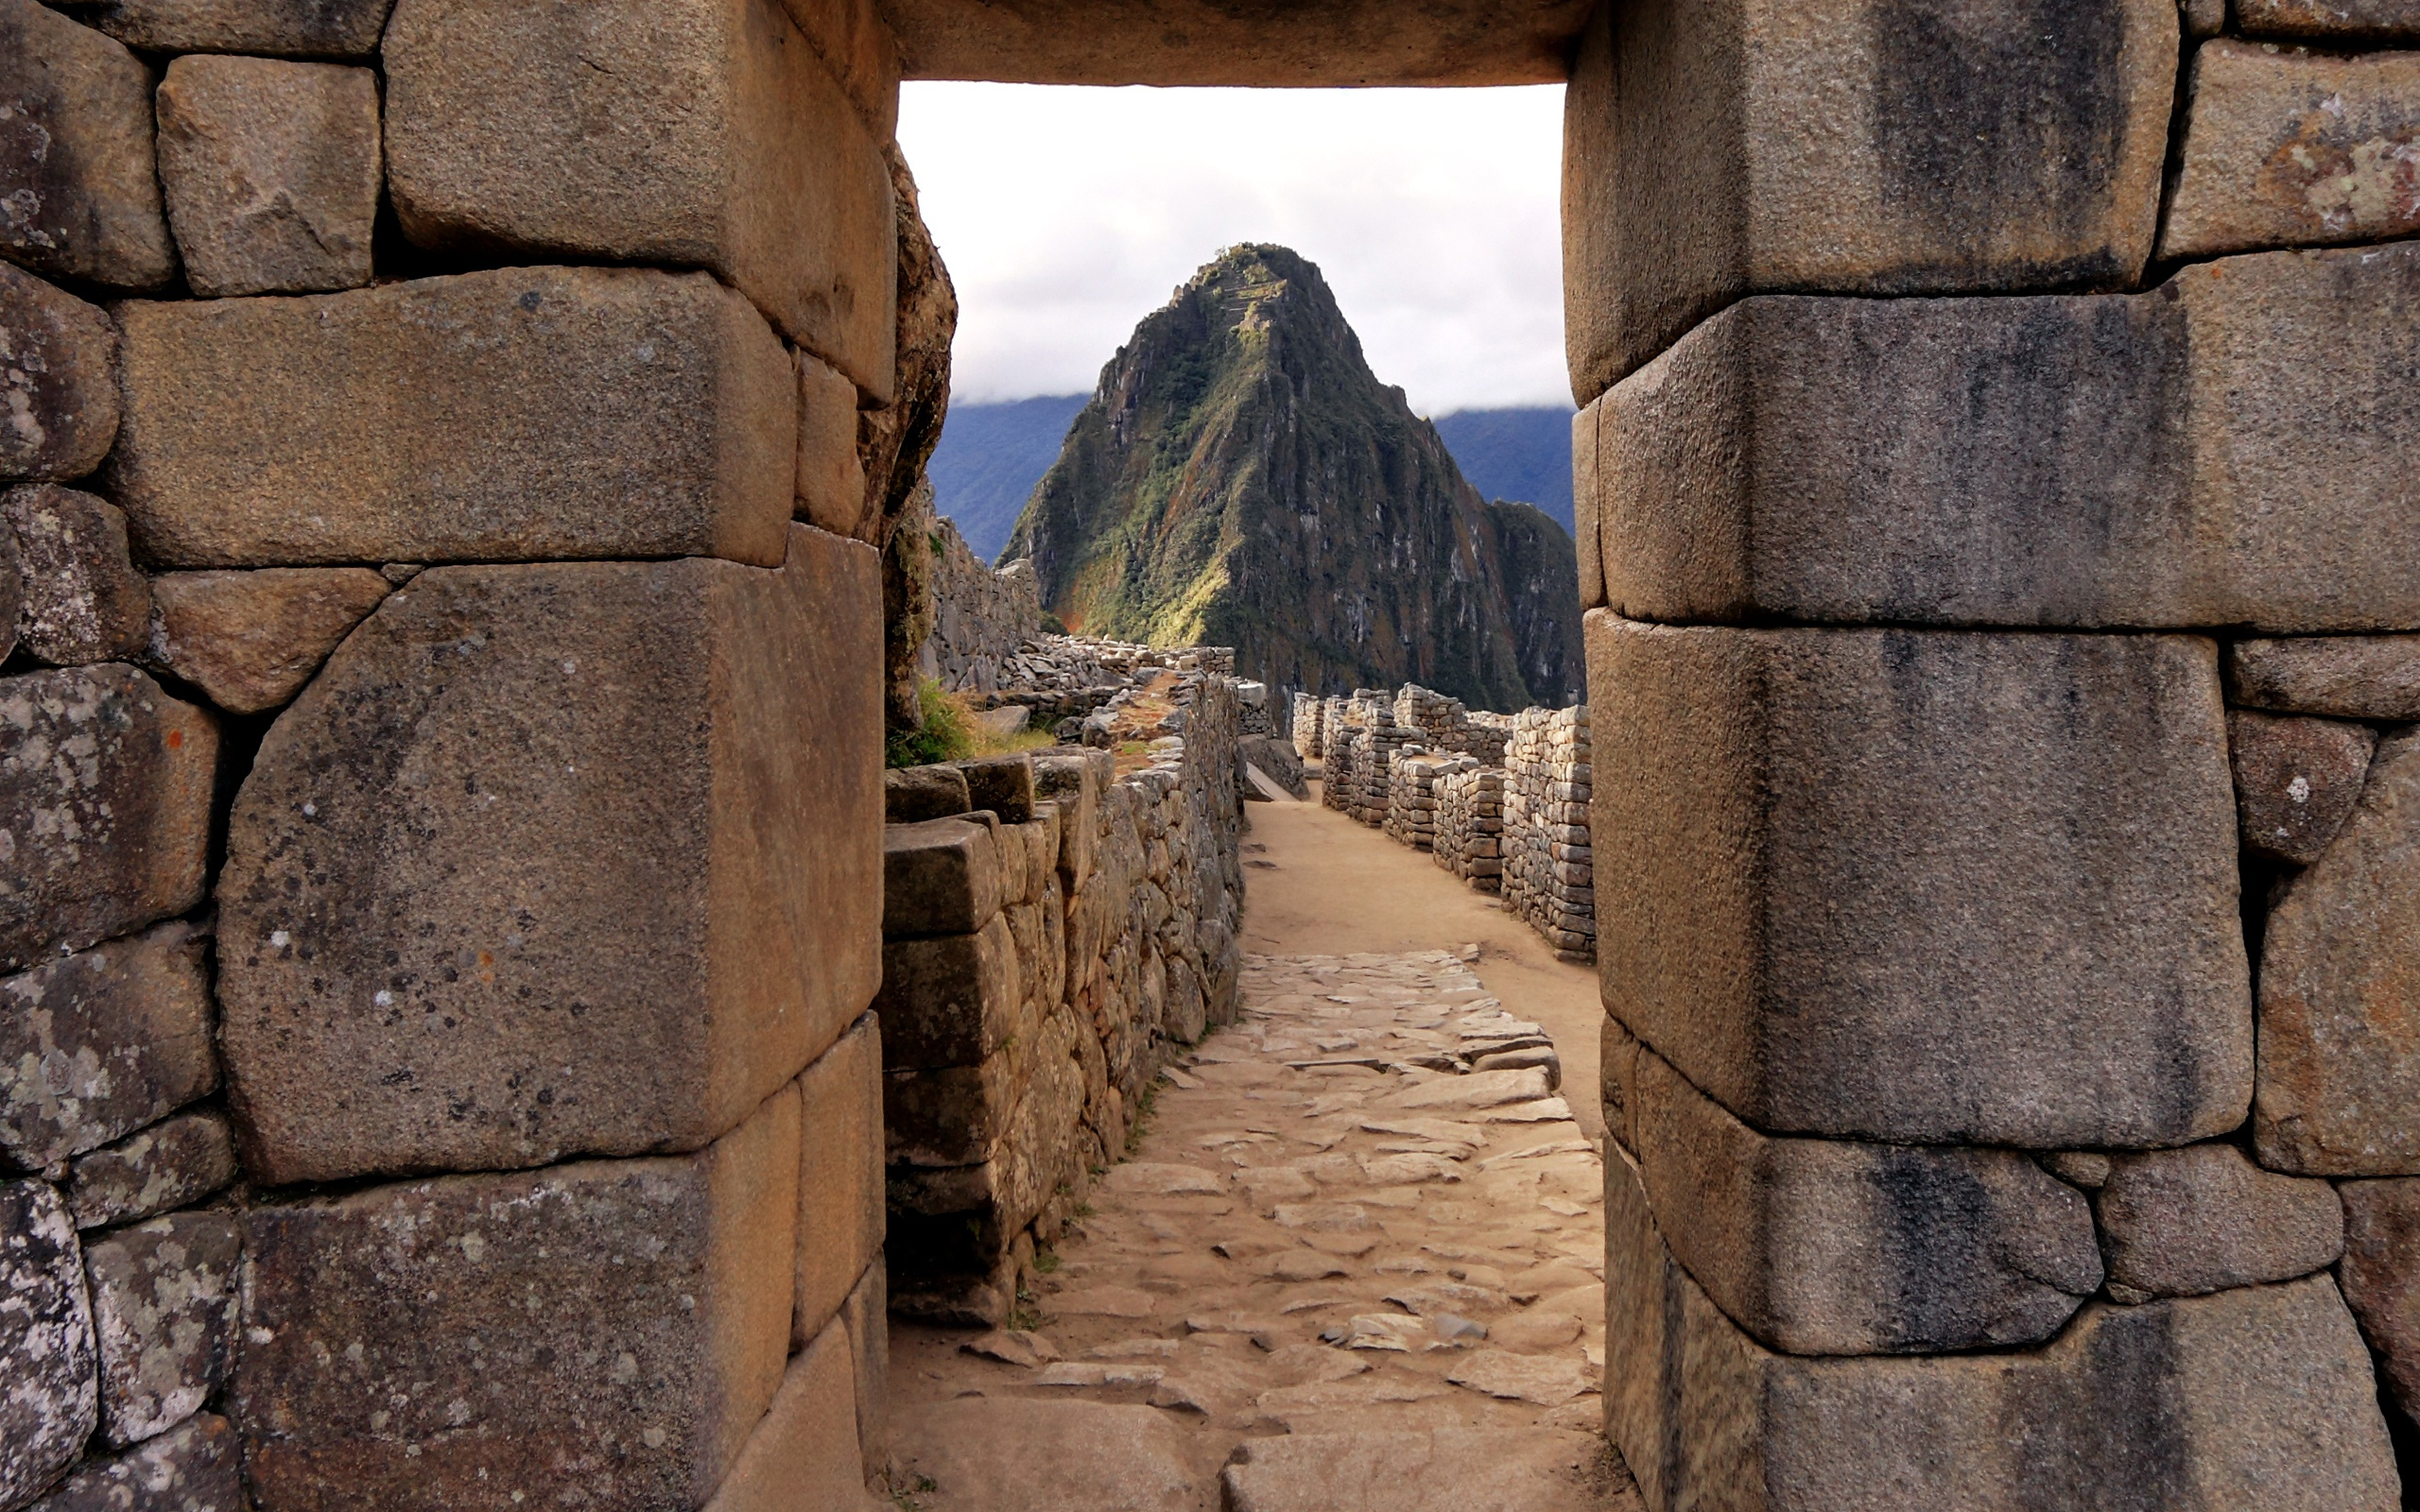 Las ruinas de Machu Pichu - 2560x1600